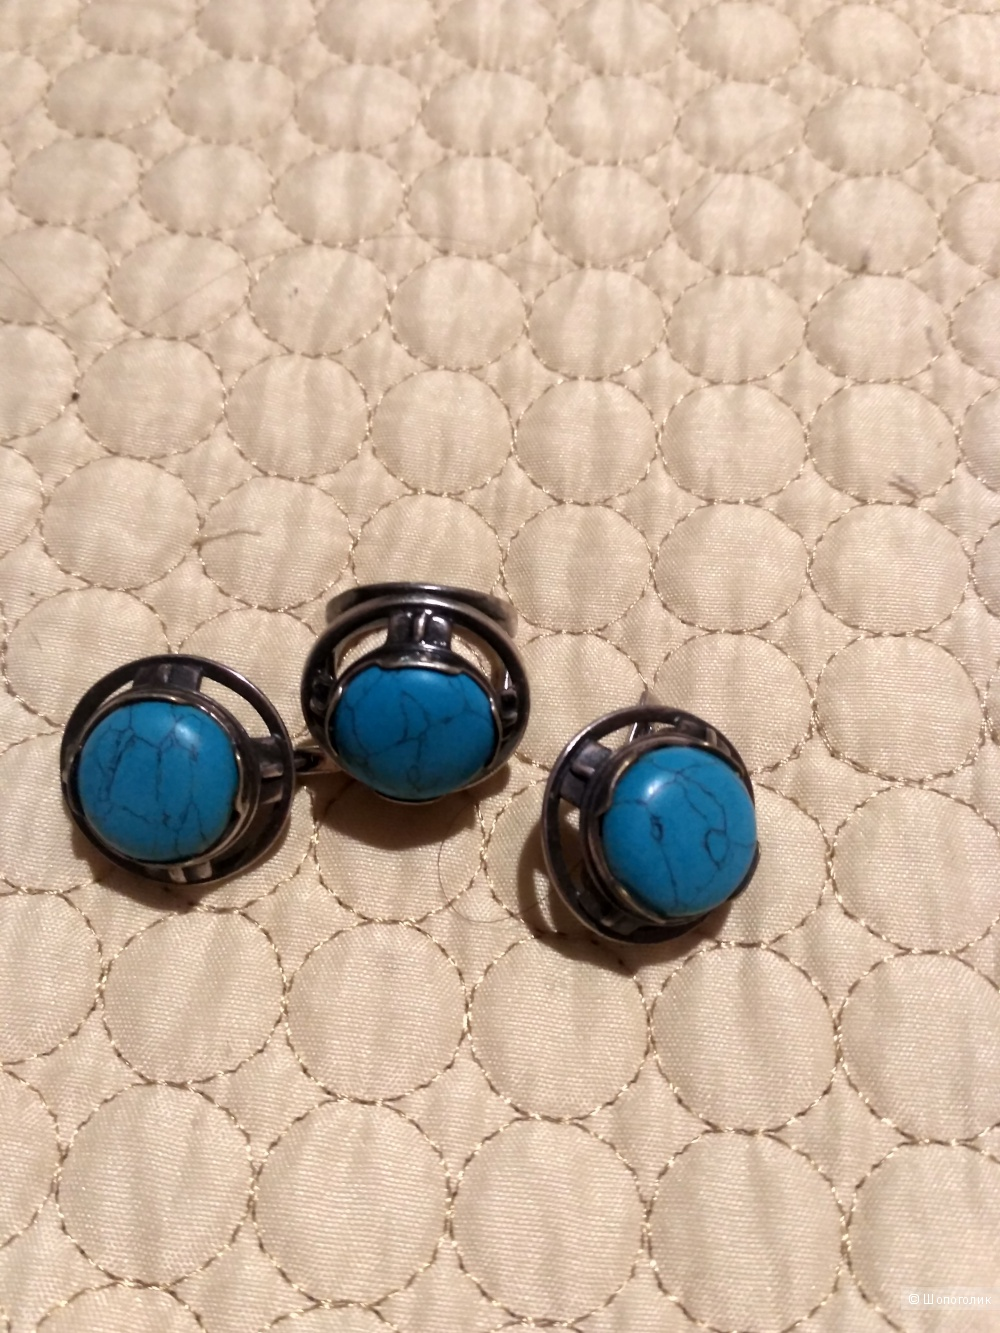 Комплект серьги и кольцо серебро 925 16.5-17 вставка бирюза